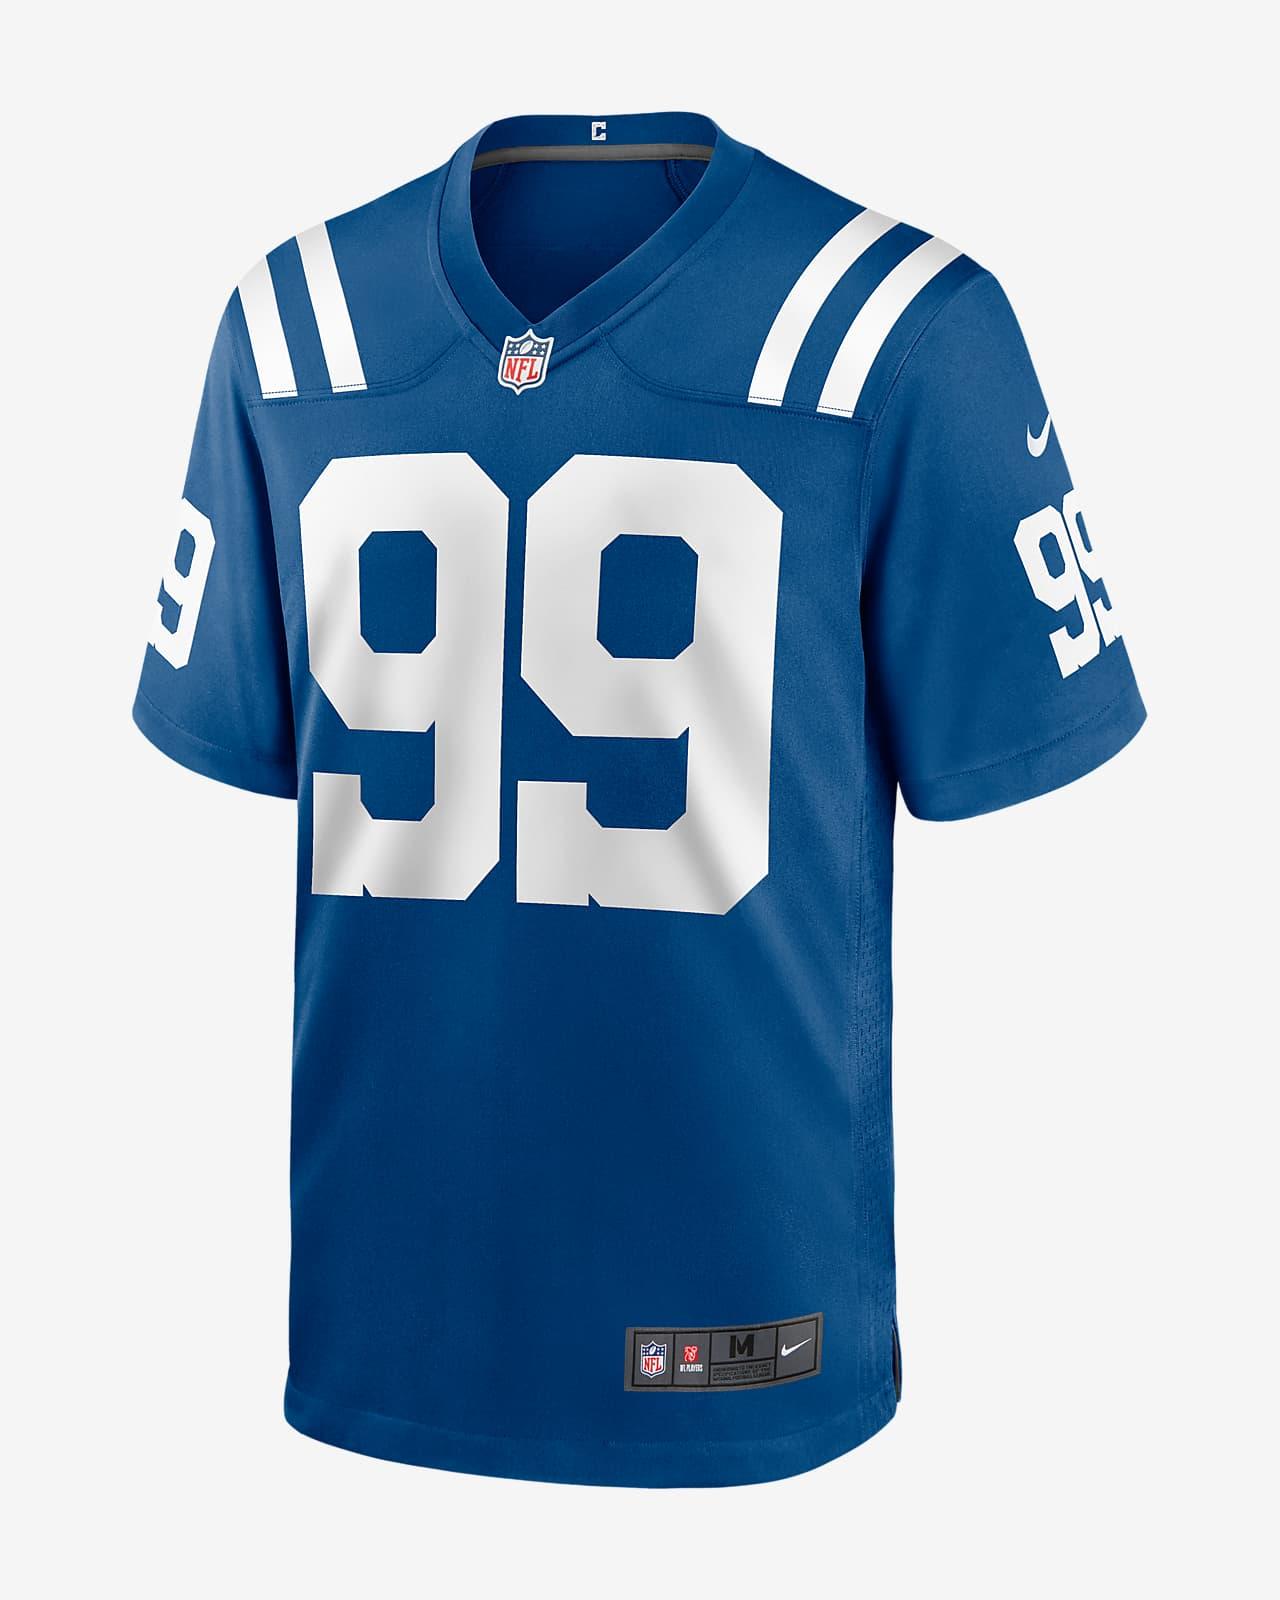 NFL Indianapolis Colts (DeForest Buckner) Men's Game Football Jersey